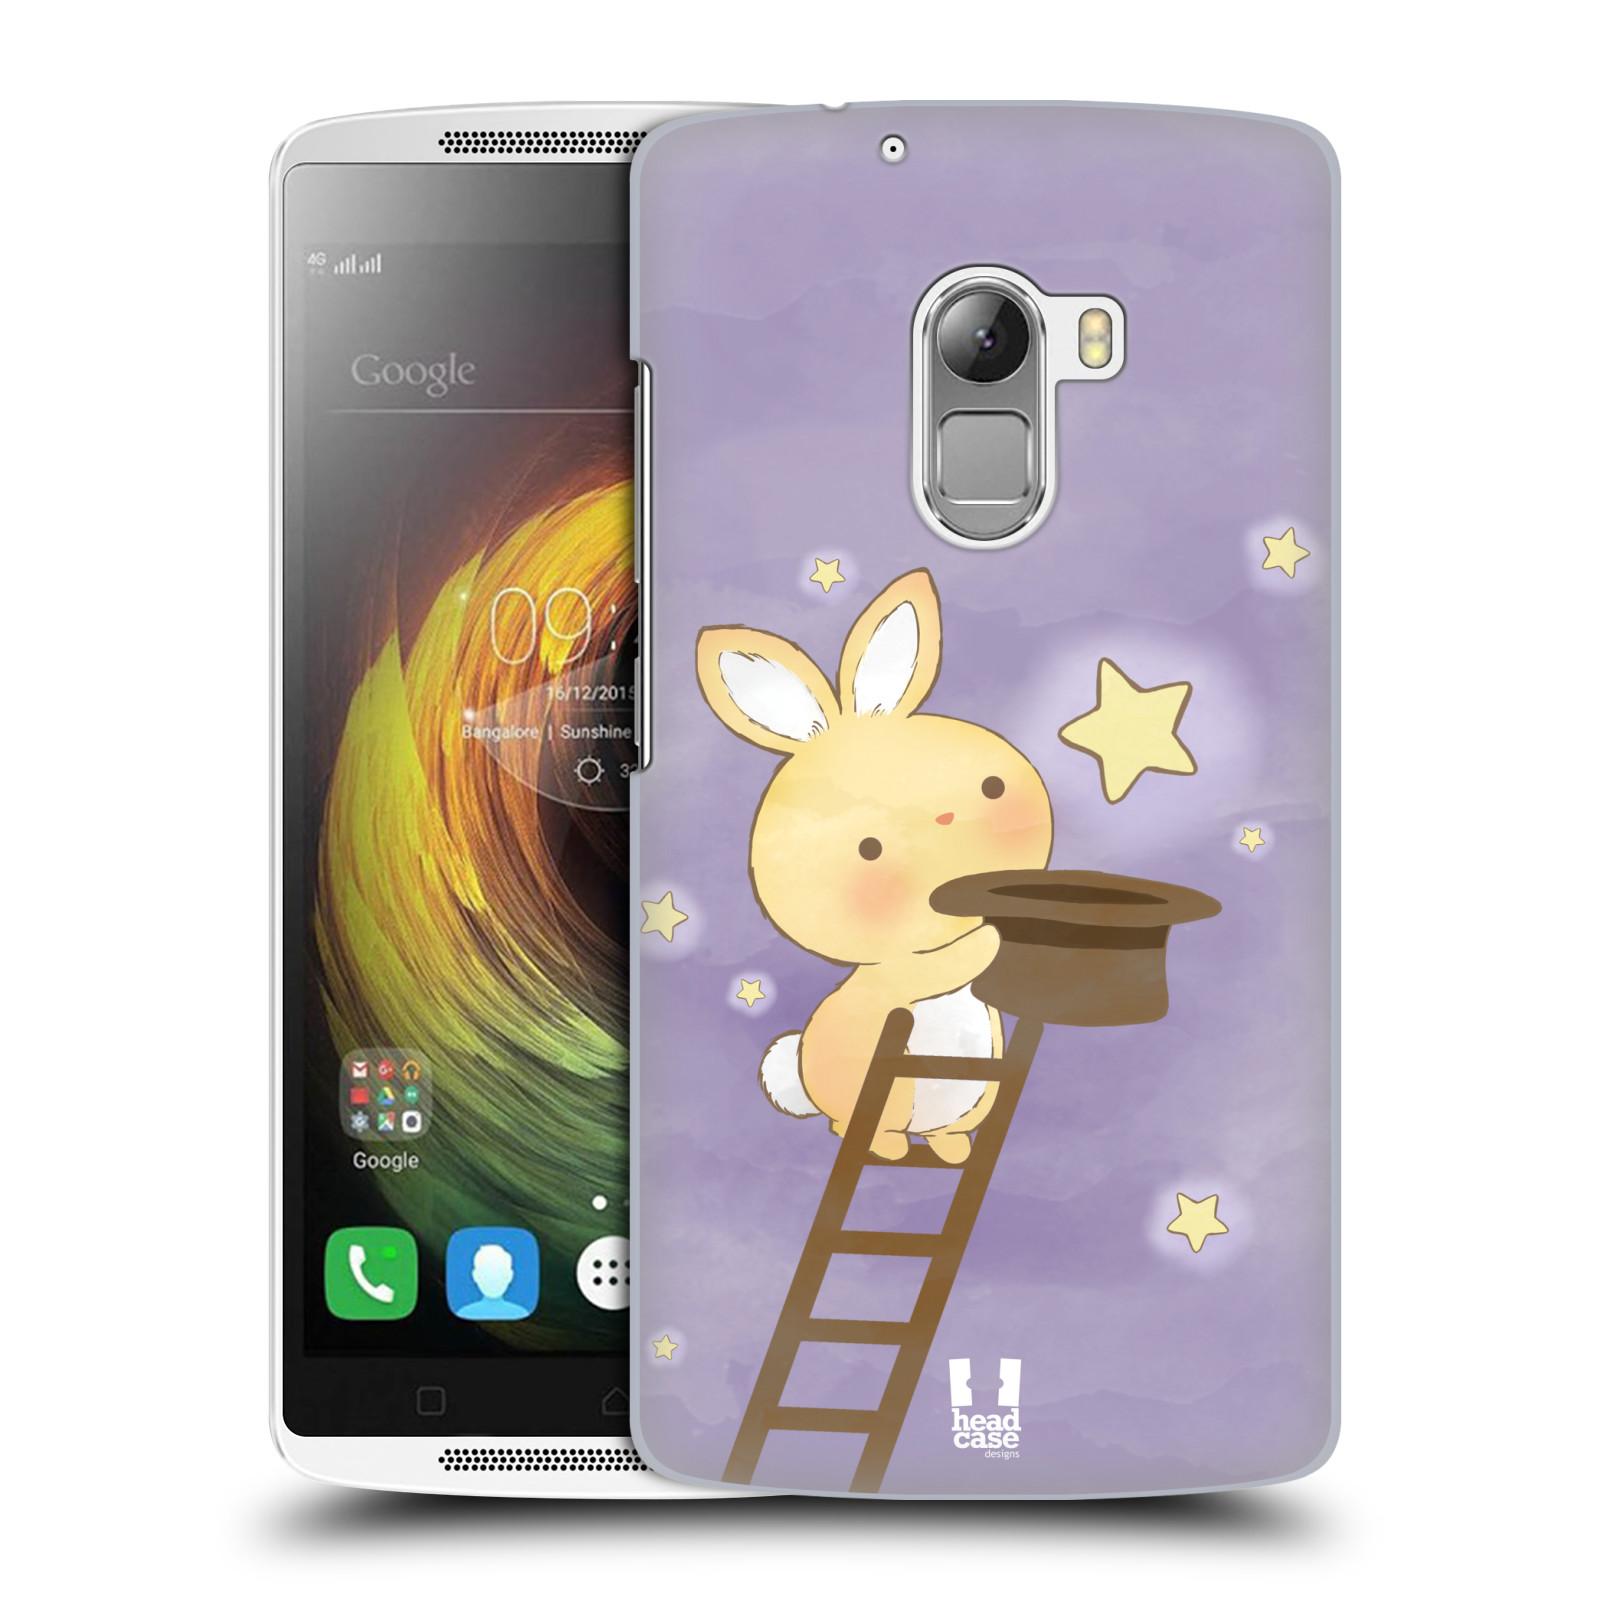 HEAD CASE pevný plastový obal na mobil LENOVO A7010 / A7010 DUAL / K4 Note / Vibe X3 lite vzor králíček a hvězdy fialová